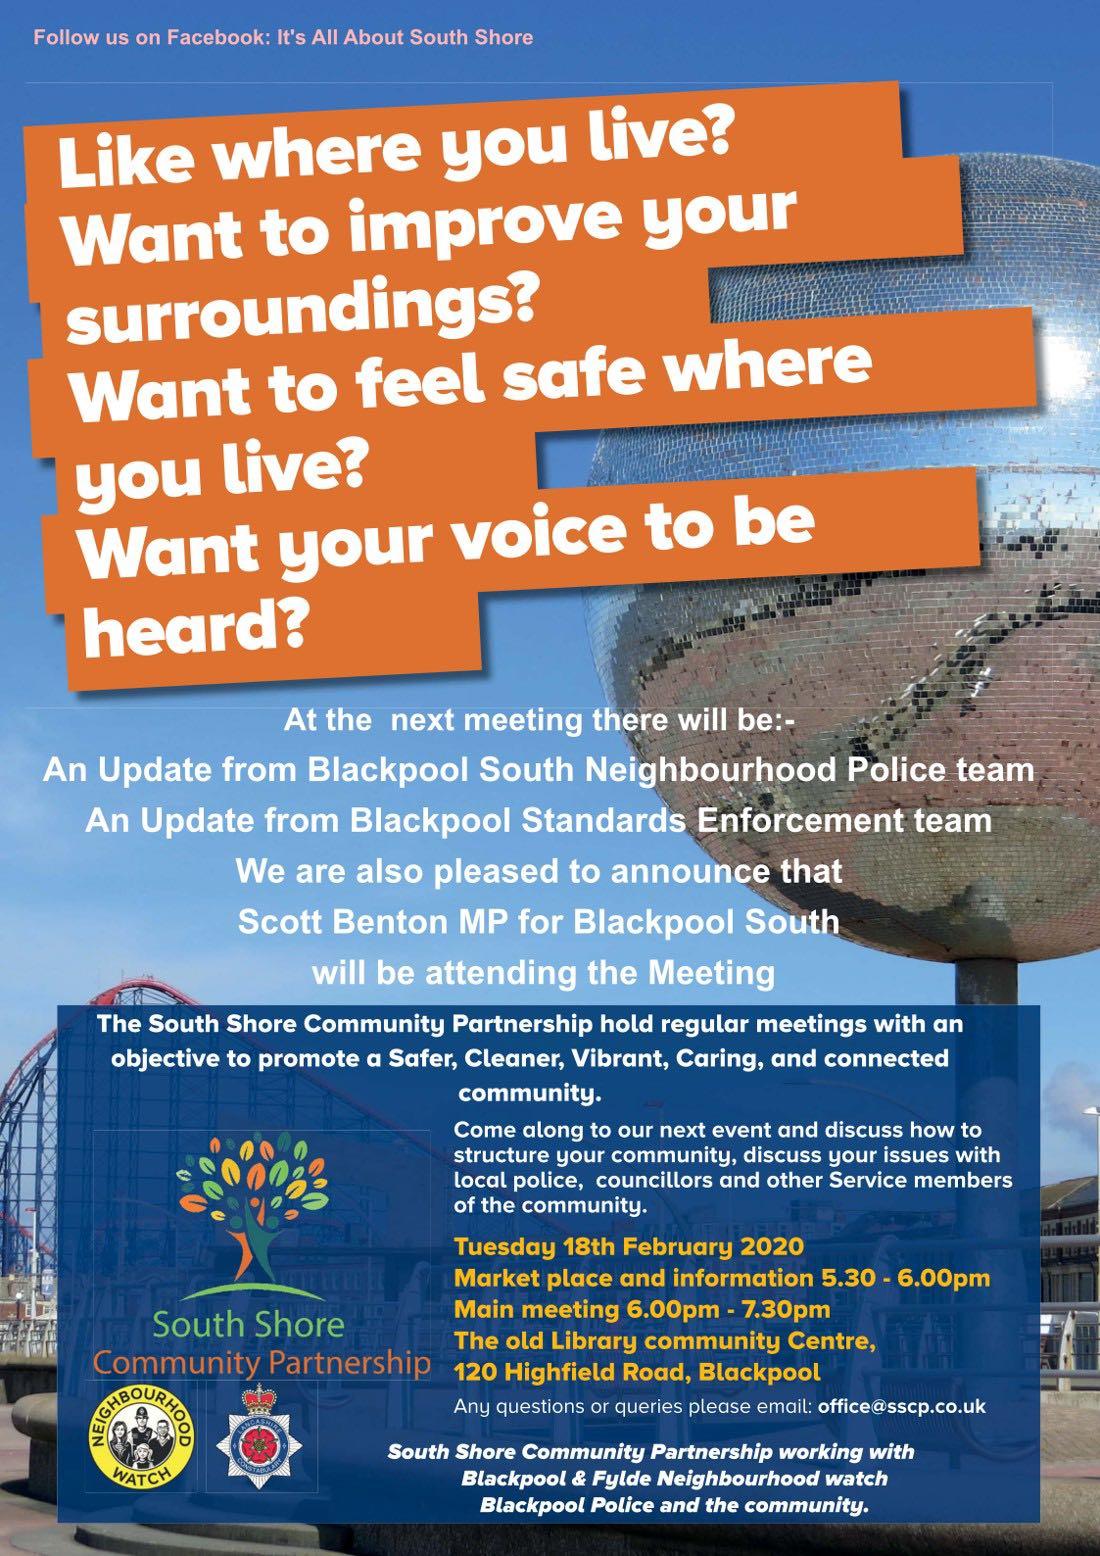 South Shore Community Partnership Meeting